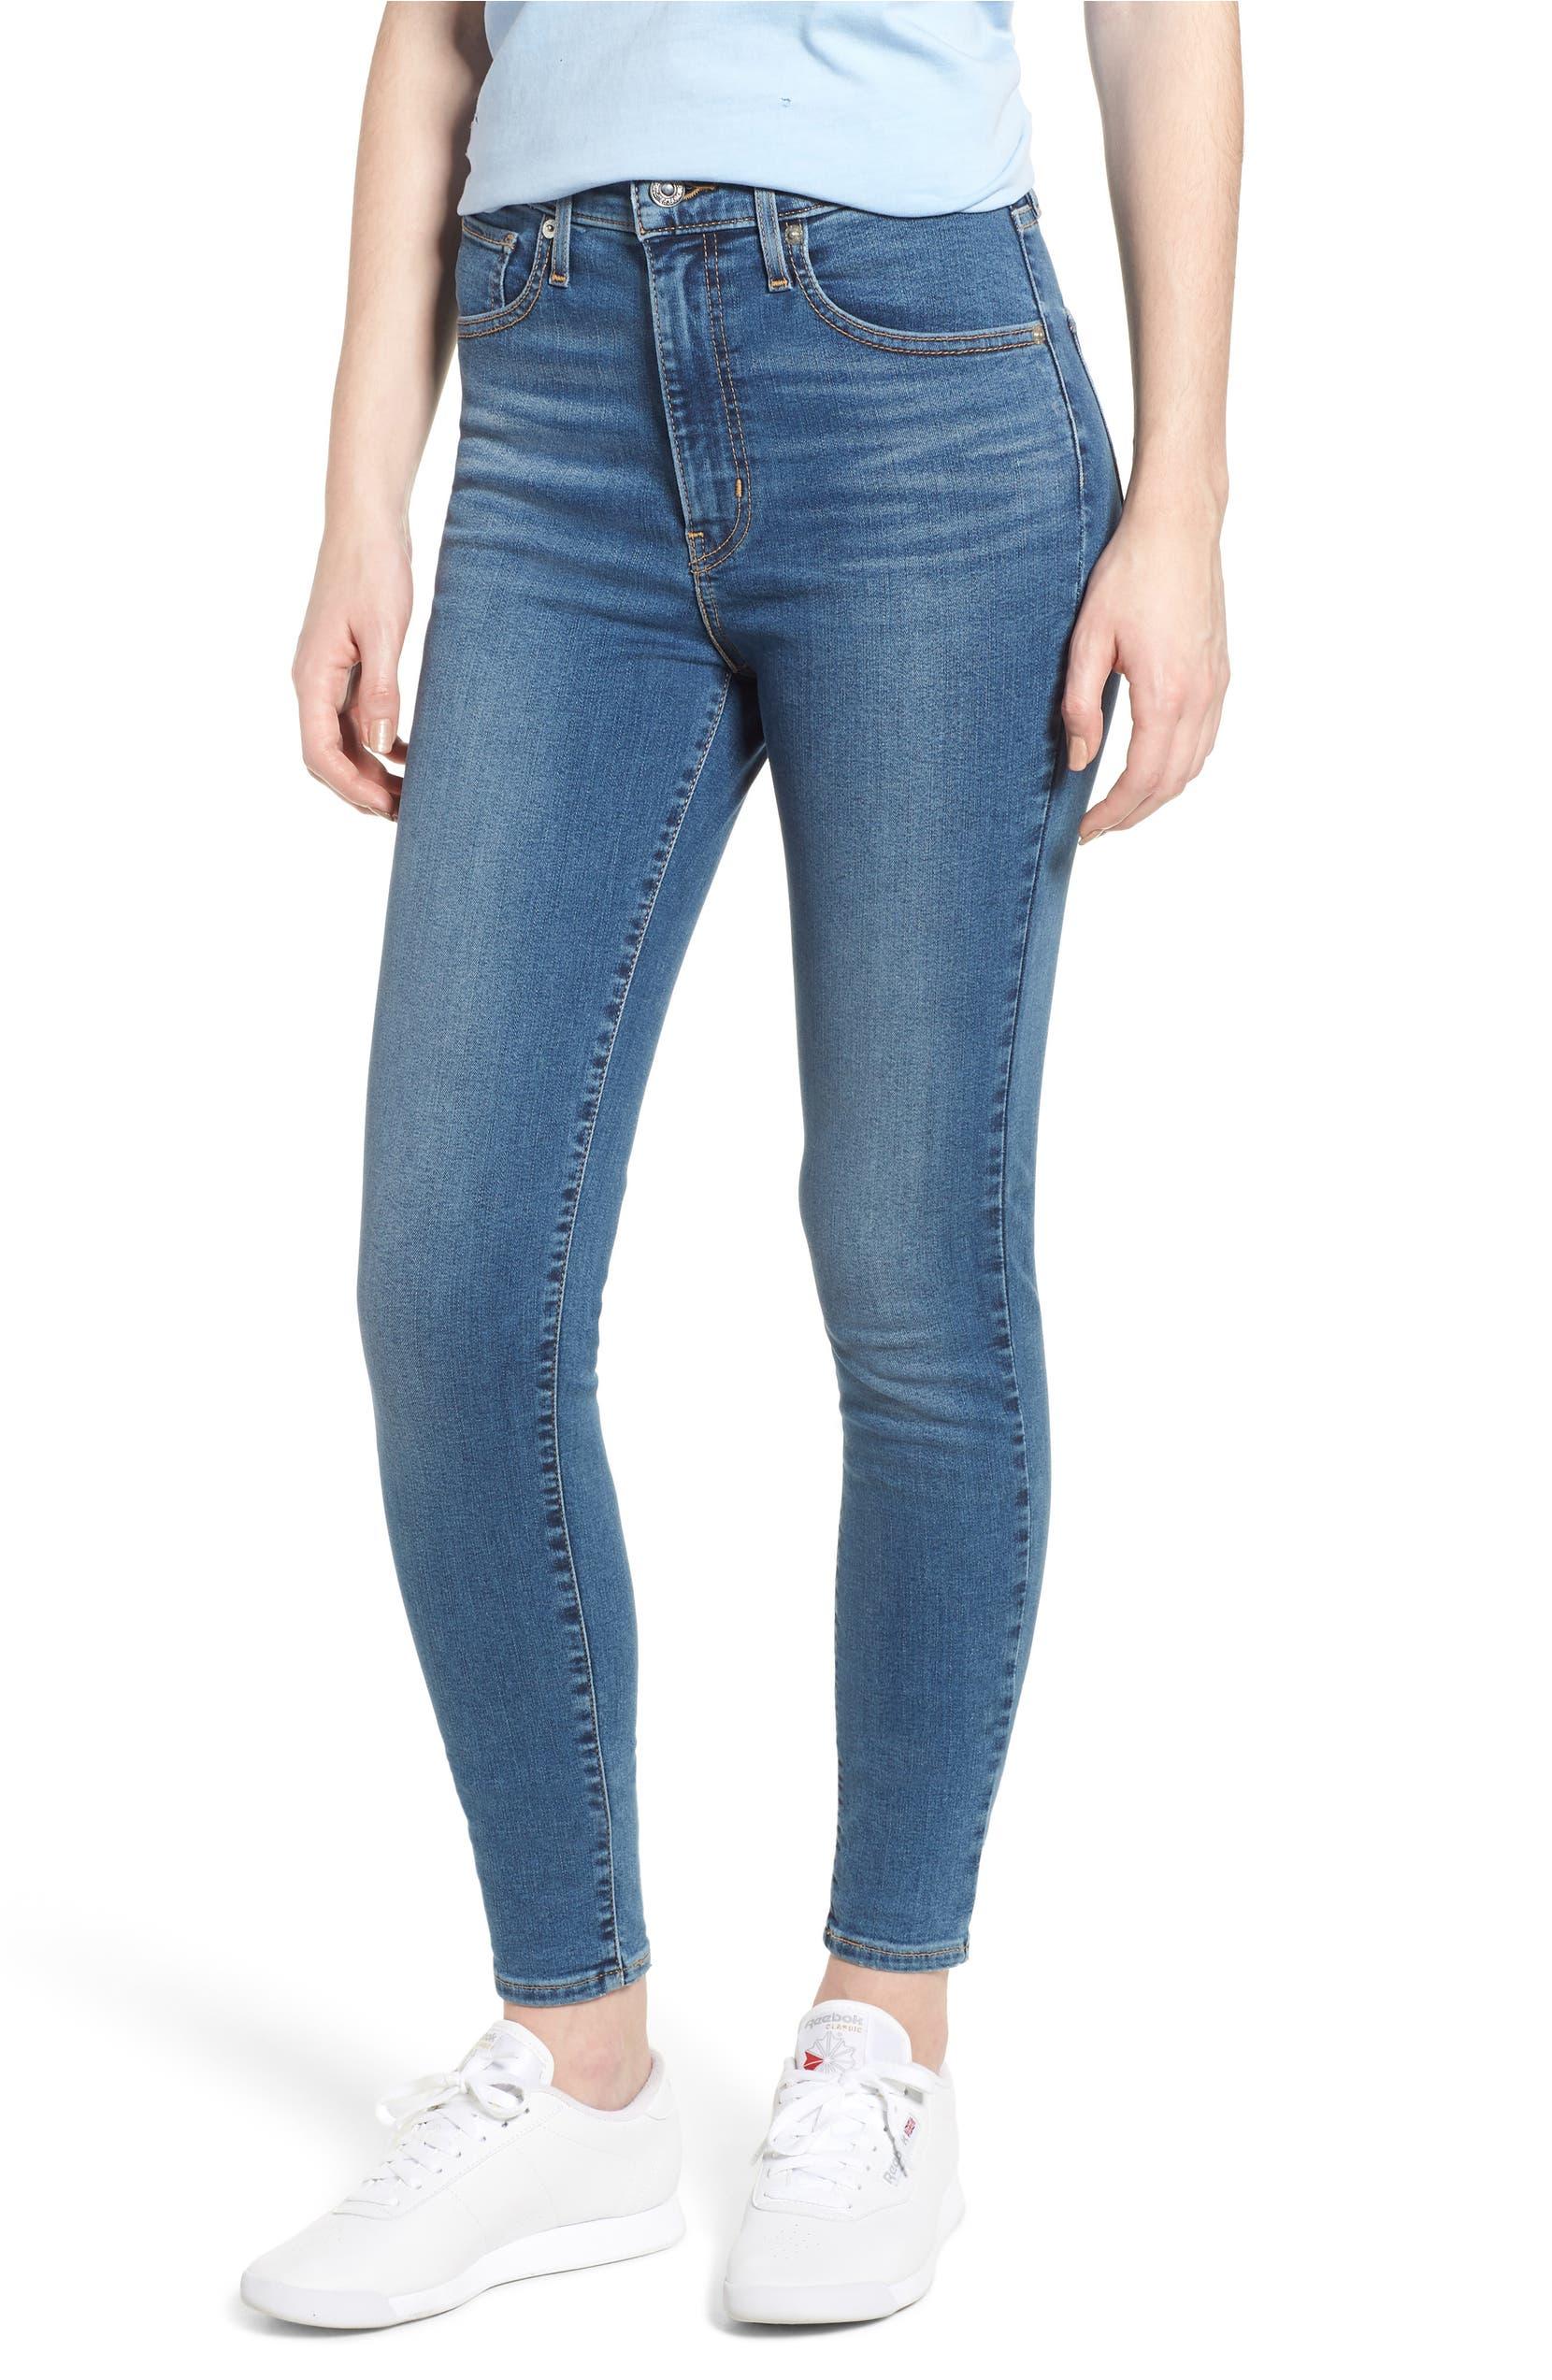 Jeans Super High Super Mile Skinny Mile High Skinny Yvyb6gf7